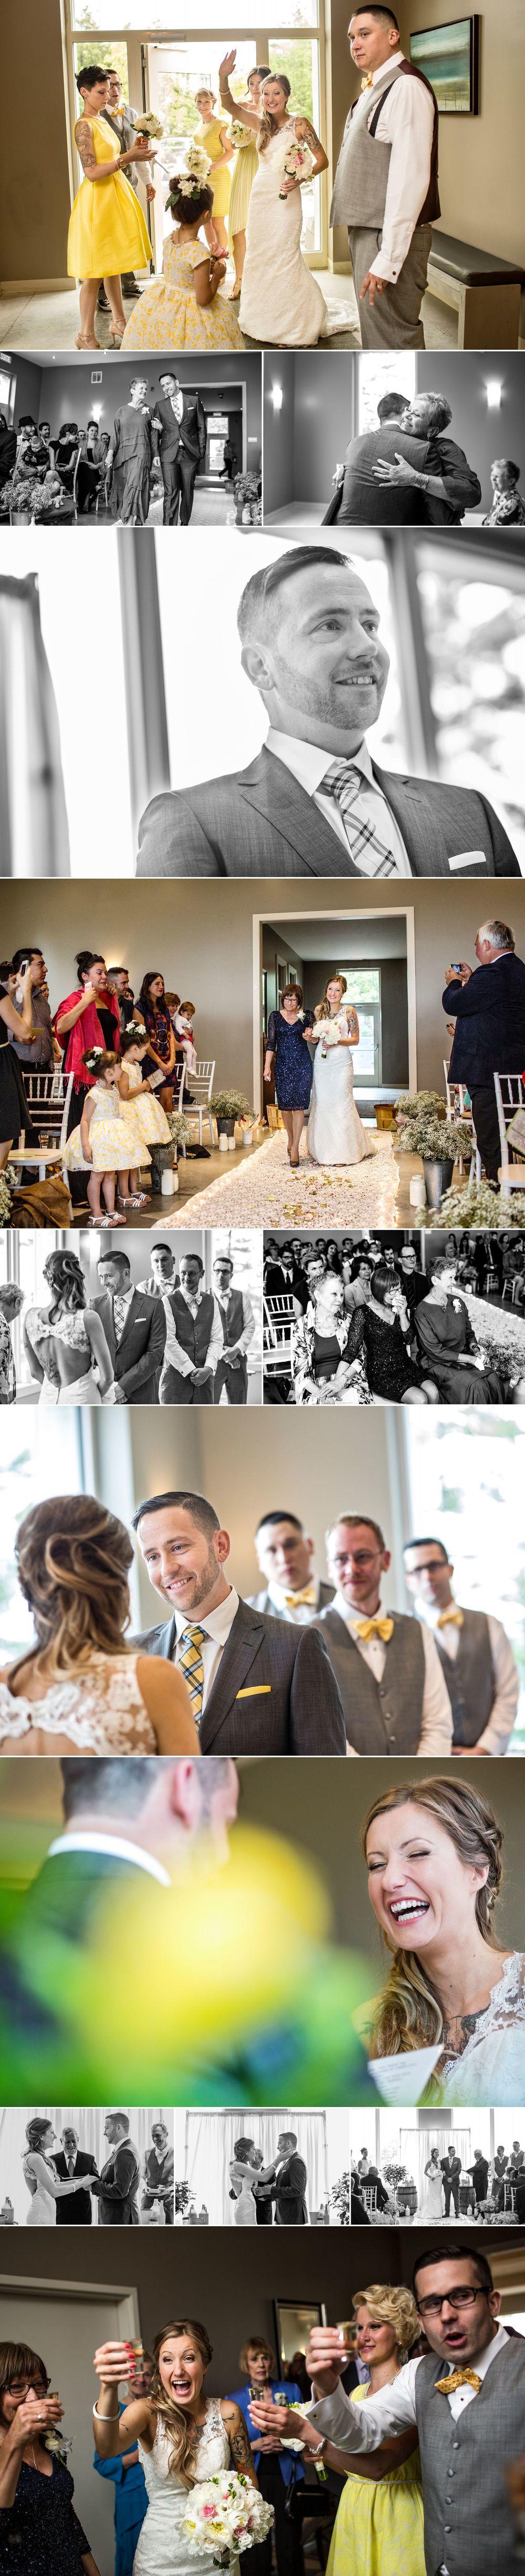 Wedding ceremony inside at le belvedere